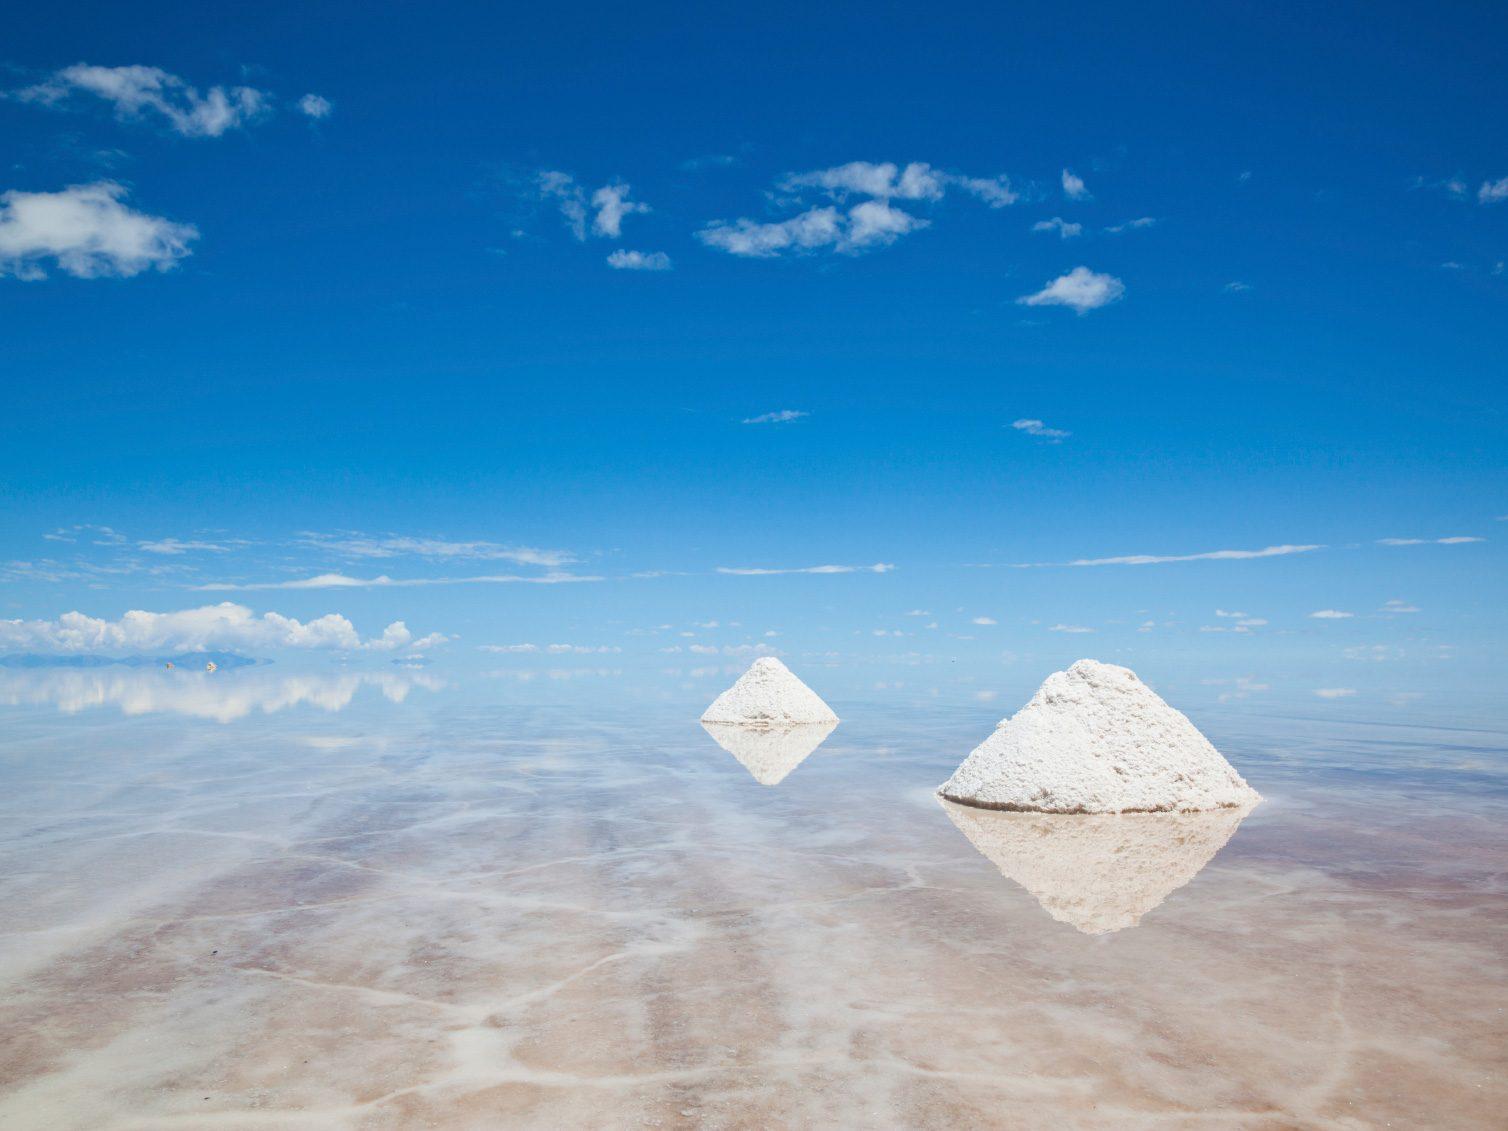 The Natural Wonder of Bolivia: Salar De Uyuni